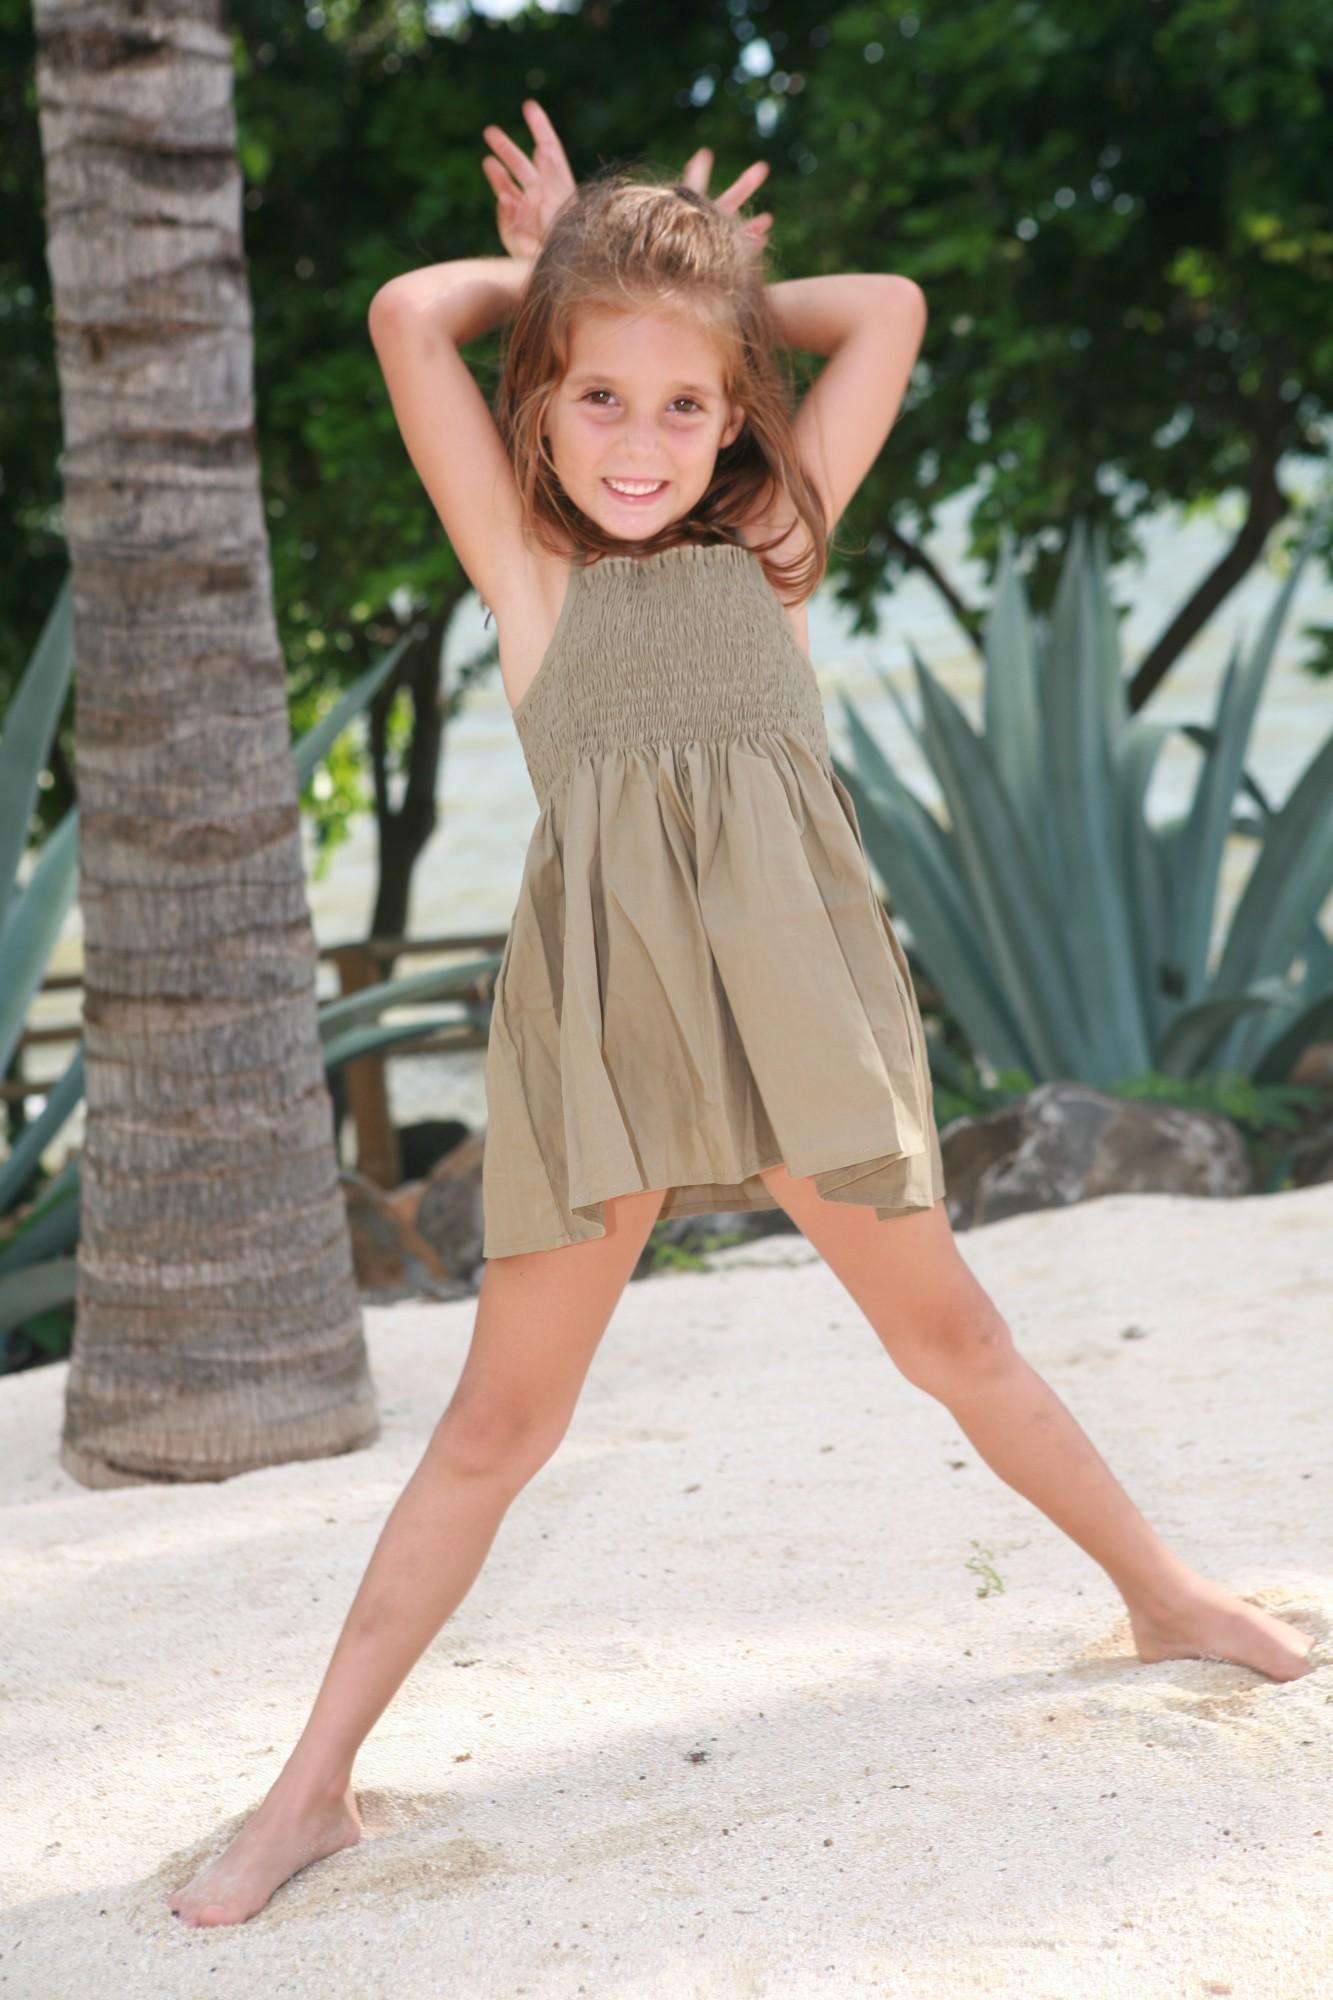 Maillot de bain Fille Soleil Vert Olive  Lorangerie